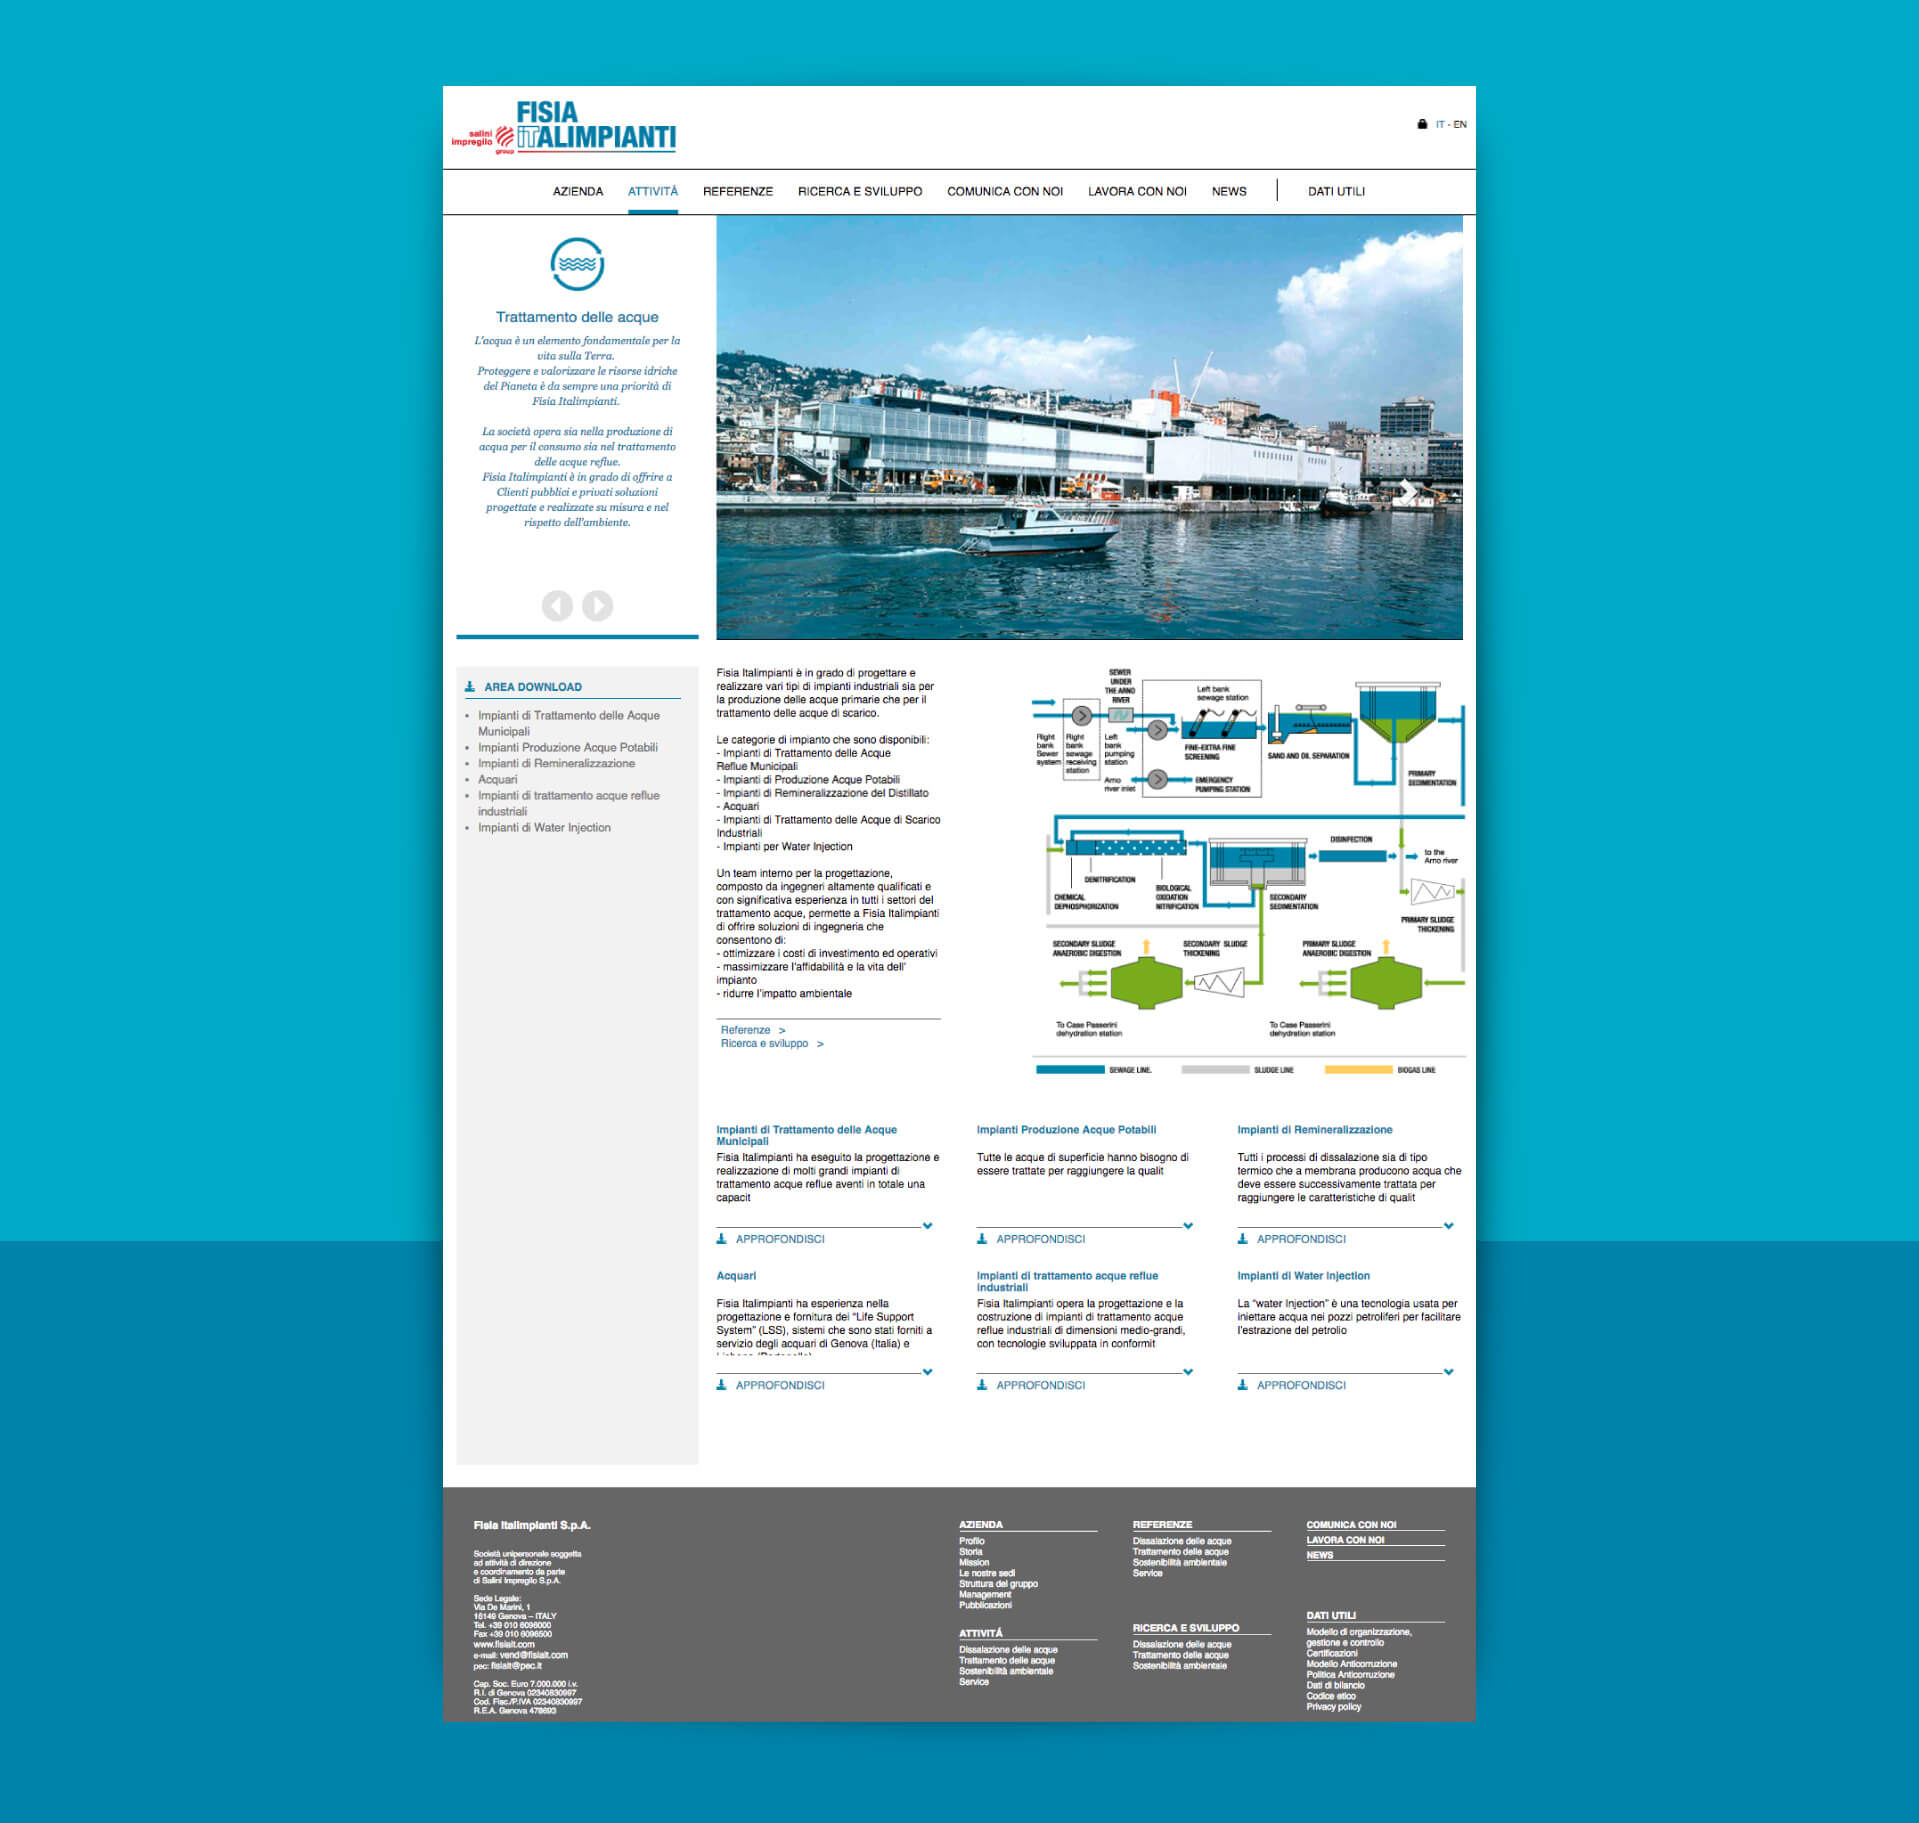 mintlab-webdesign-fisia-italimpianti-04